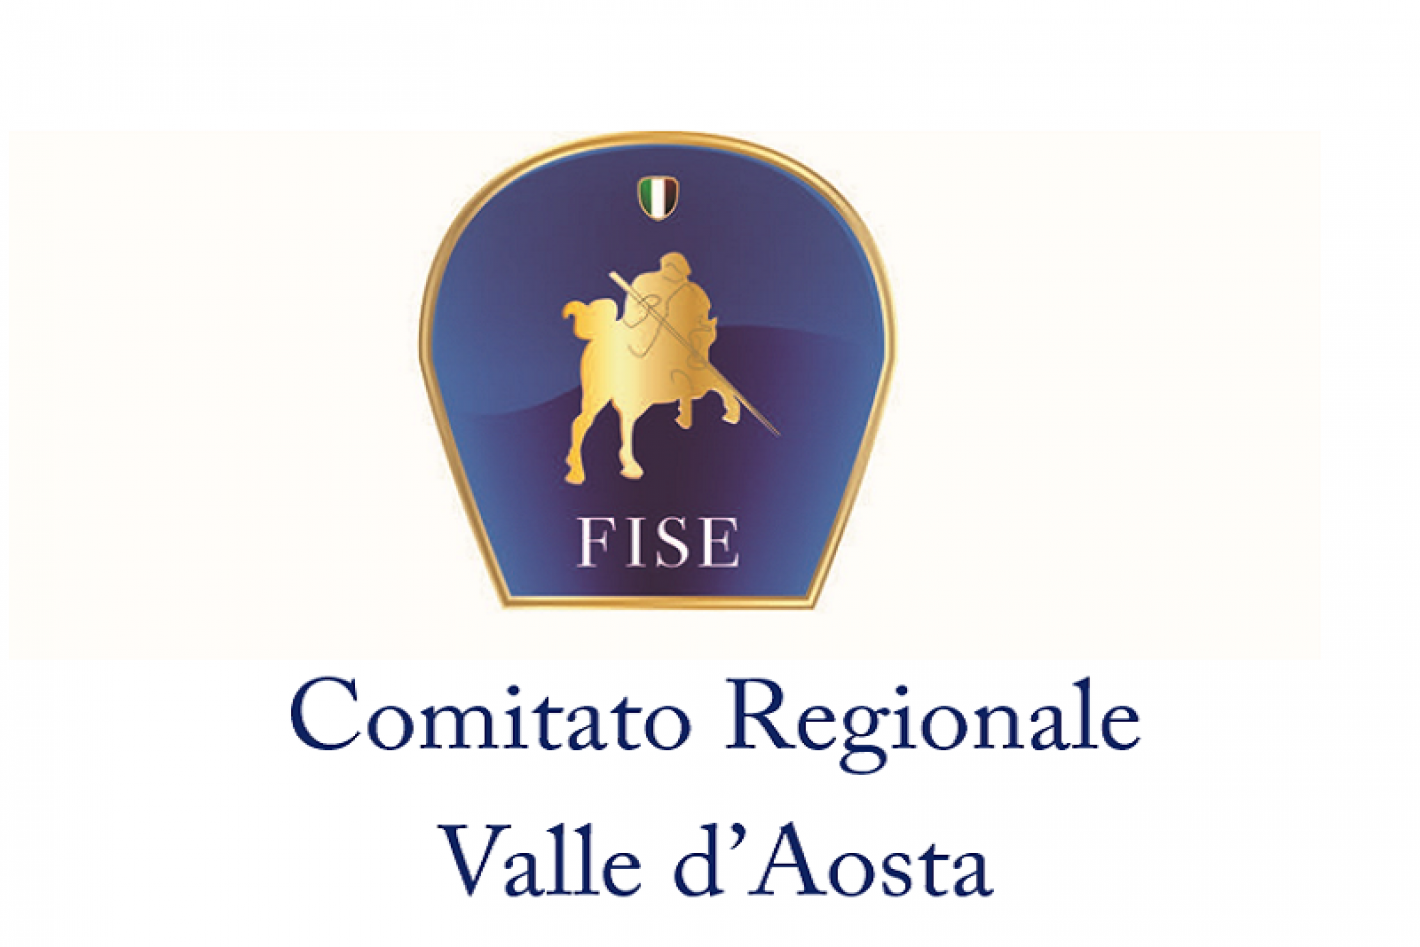 Fise Calendario Regionale.Federazione Italiana Sport Equestri Cr Valle D Aosta